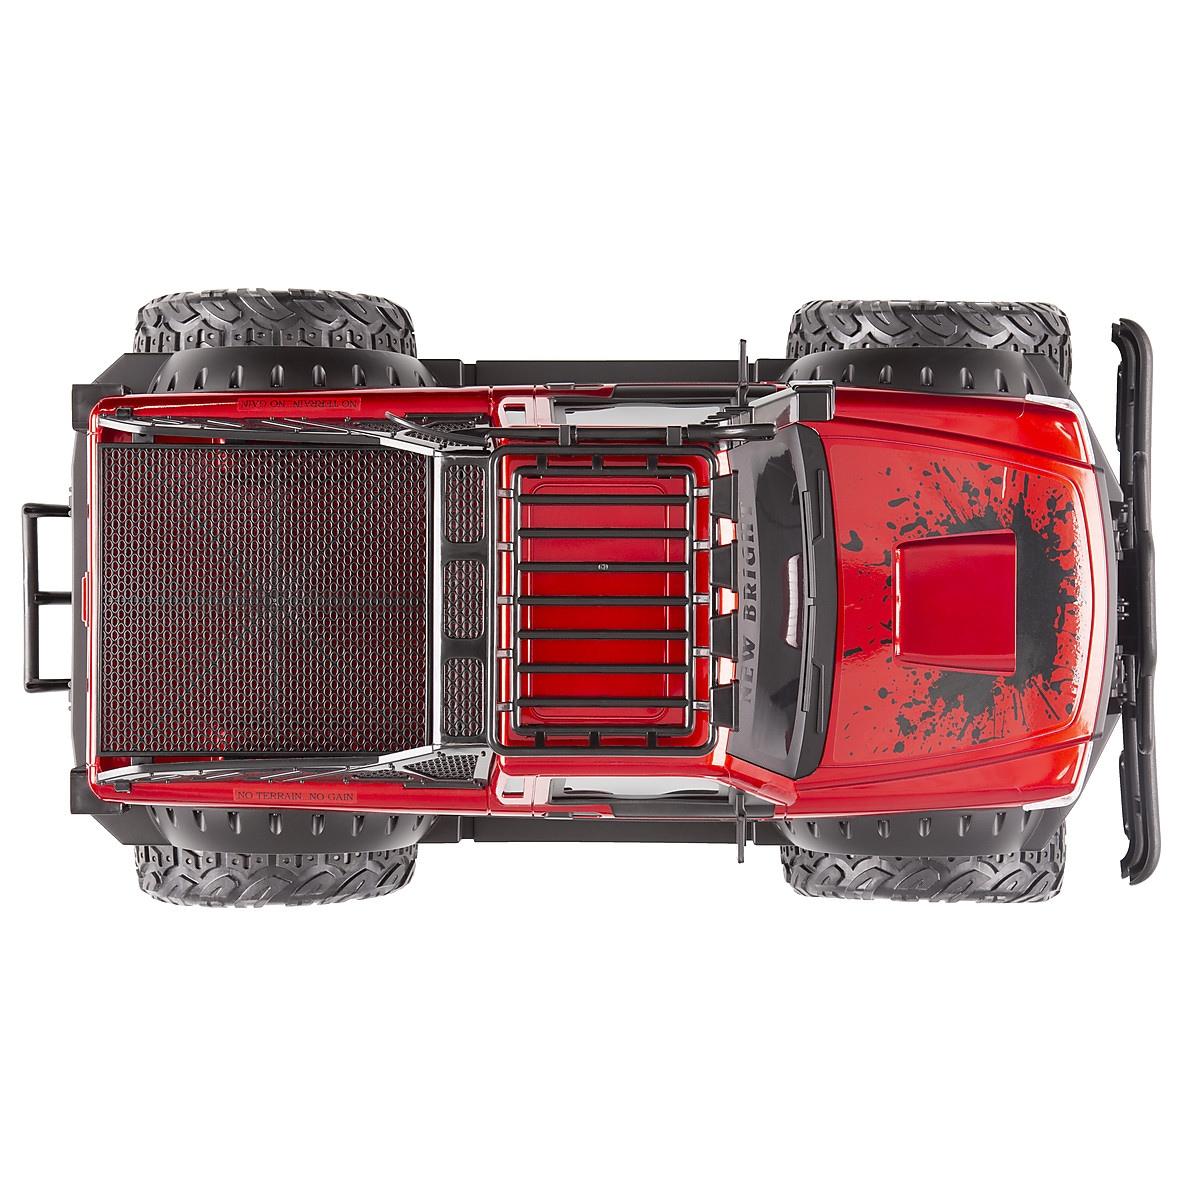 Radiostyrd bil New Bright Brutus